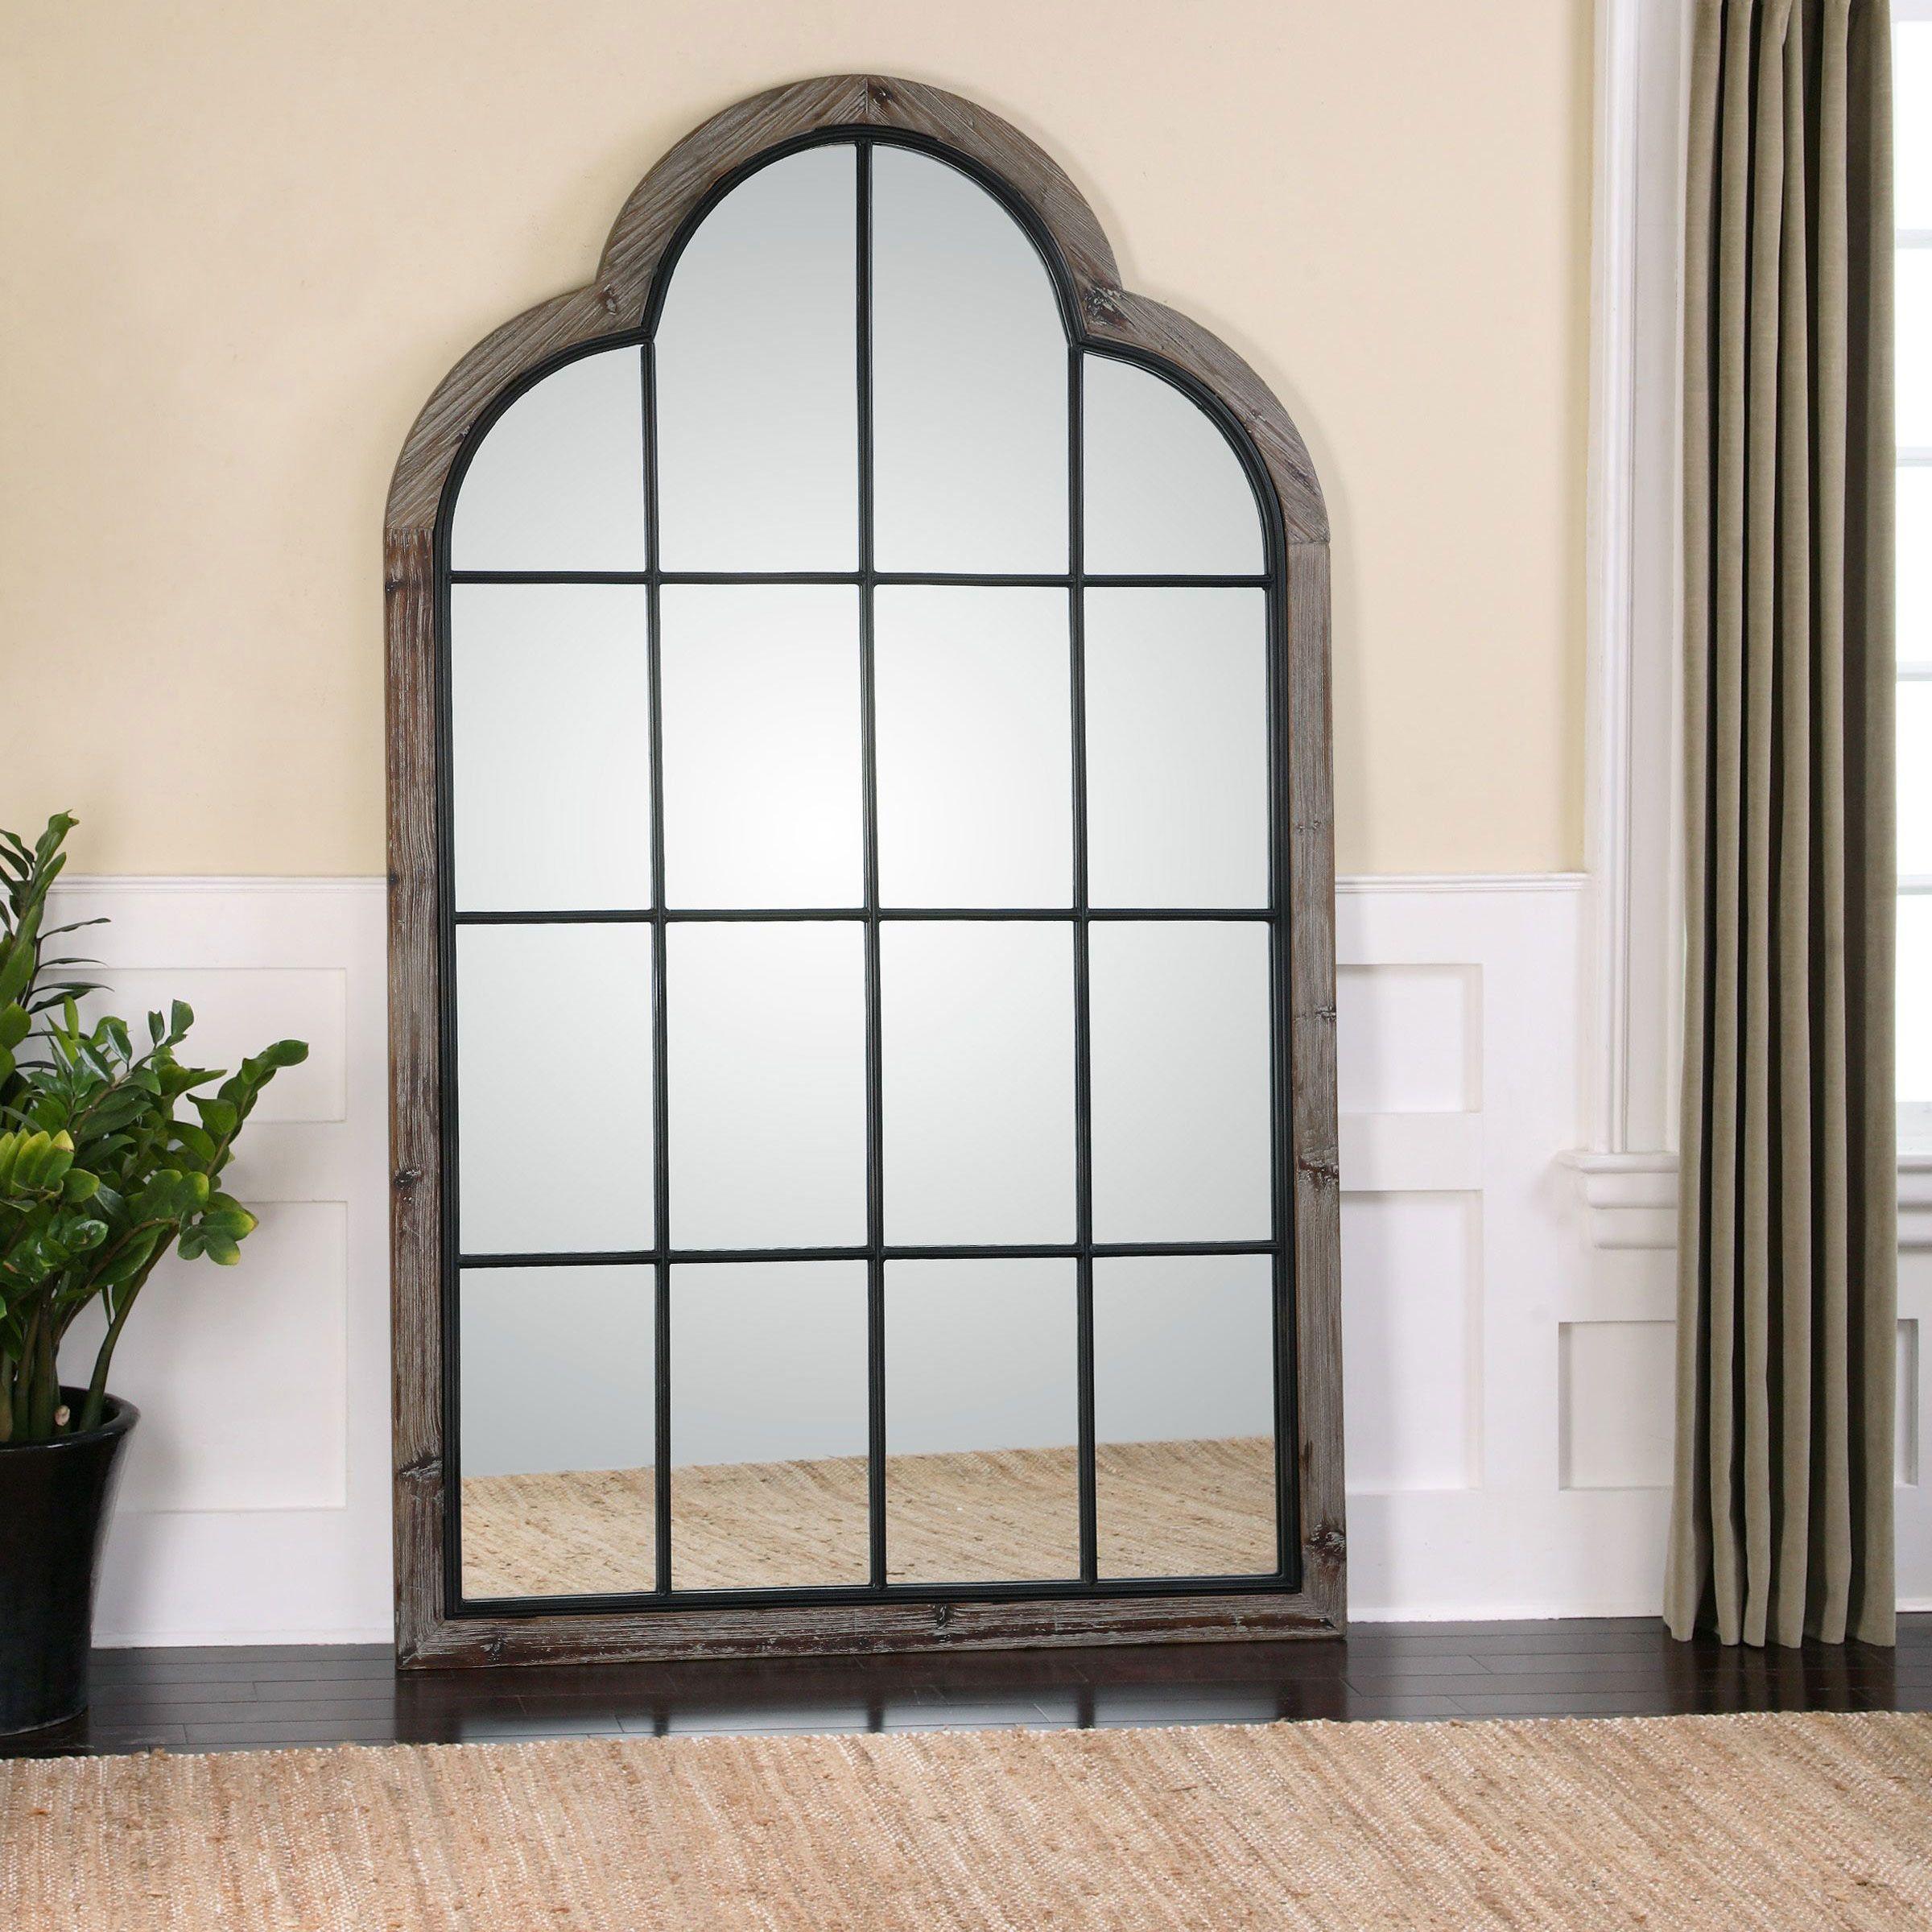 Gavin Rustic Lodge Iron Pane Arch Floor Mirror | Floor mirror, Grey ...